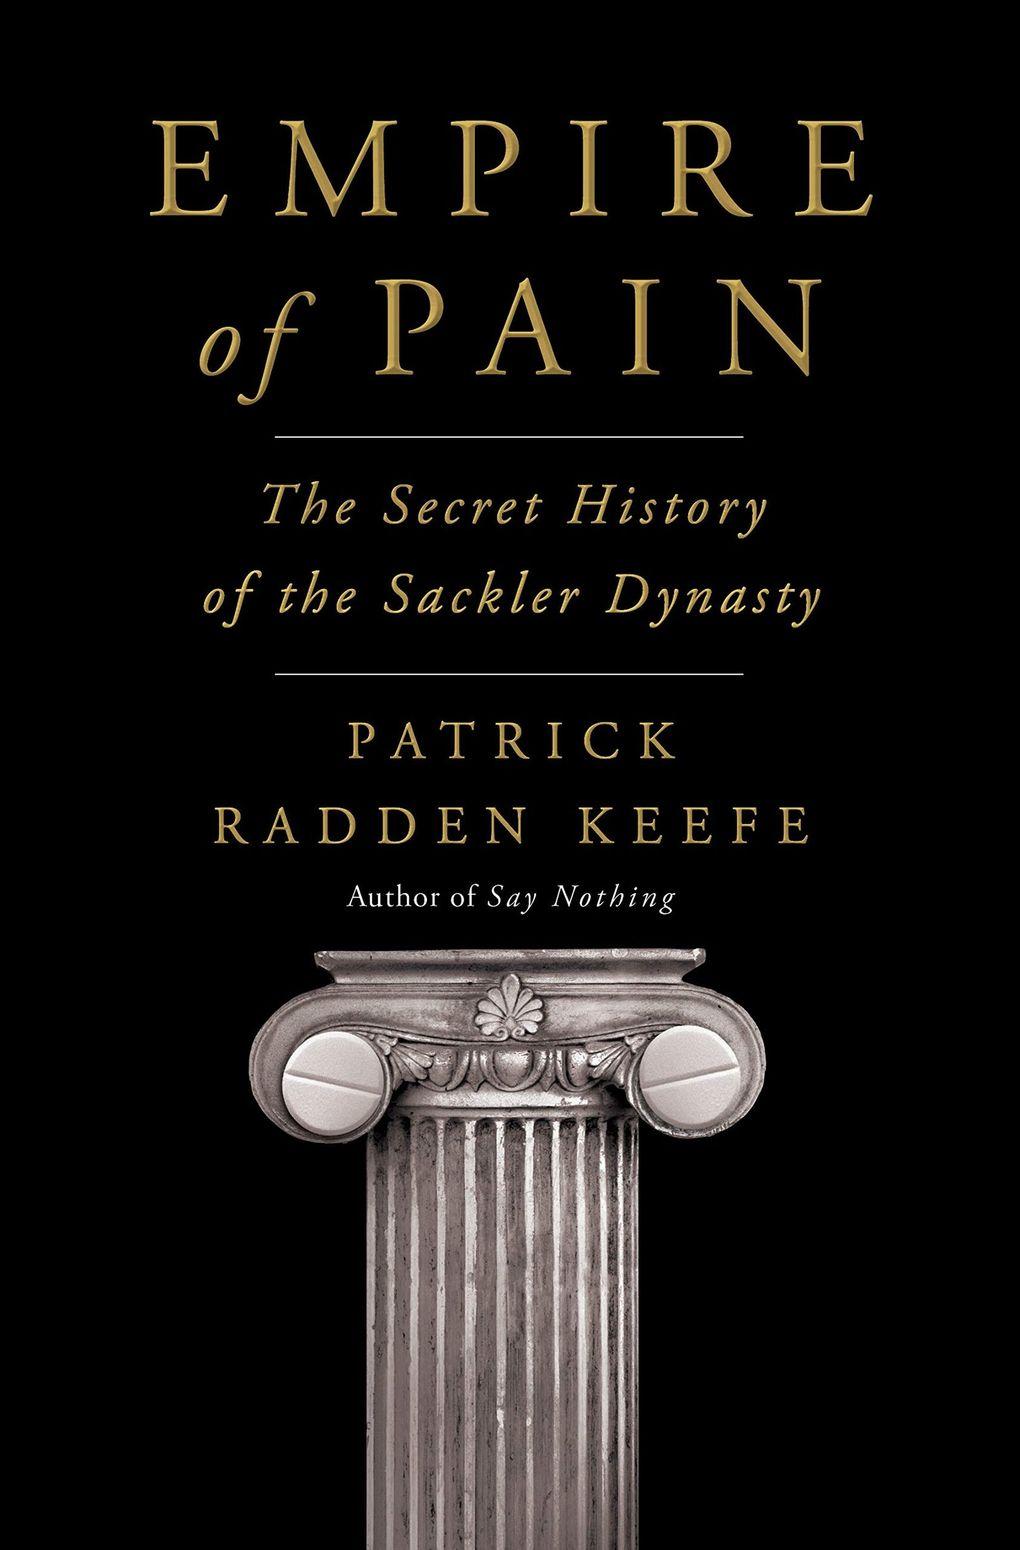 """Empire of Pain: The Secret History of the Sackler Dynasty"" by Patrick Radden Keefe (Penguin Random House)"